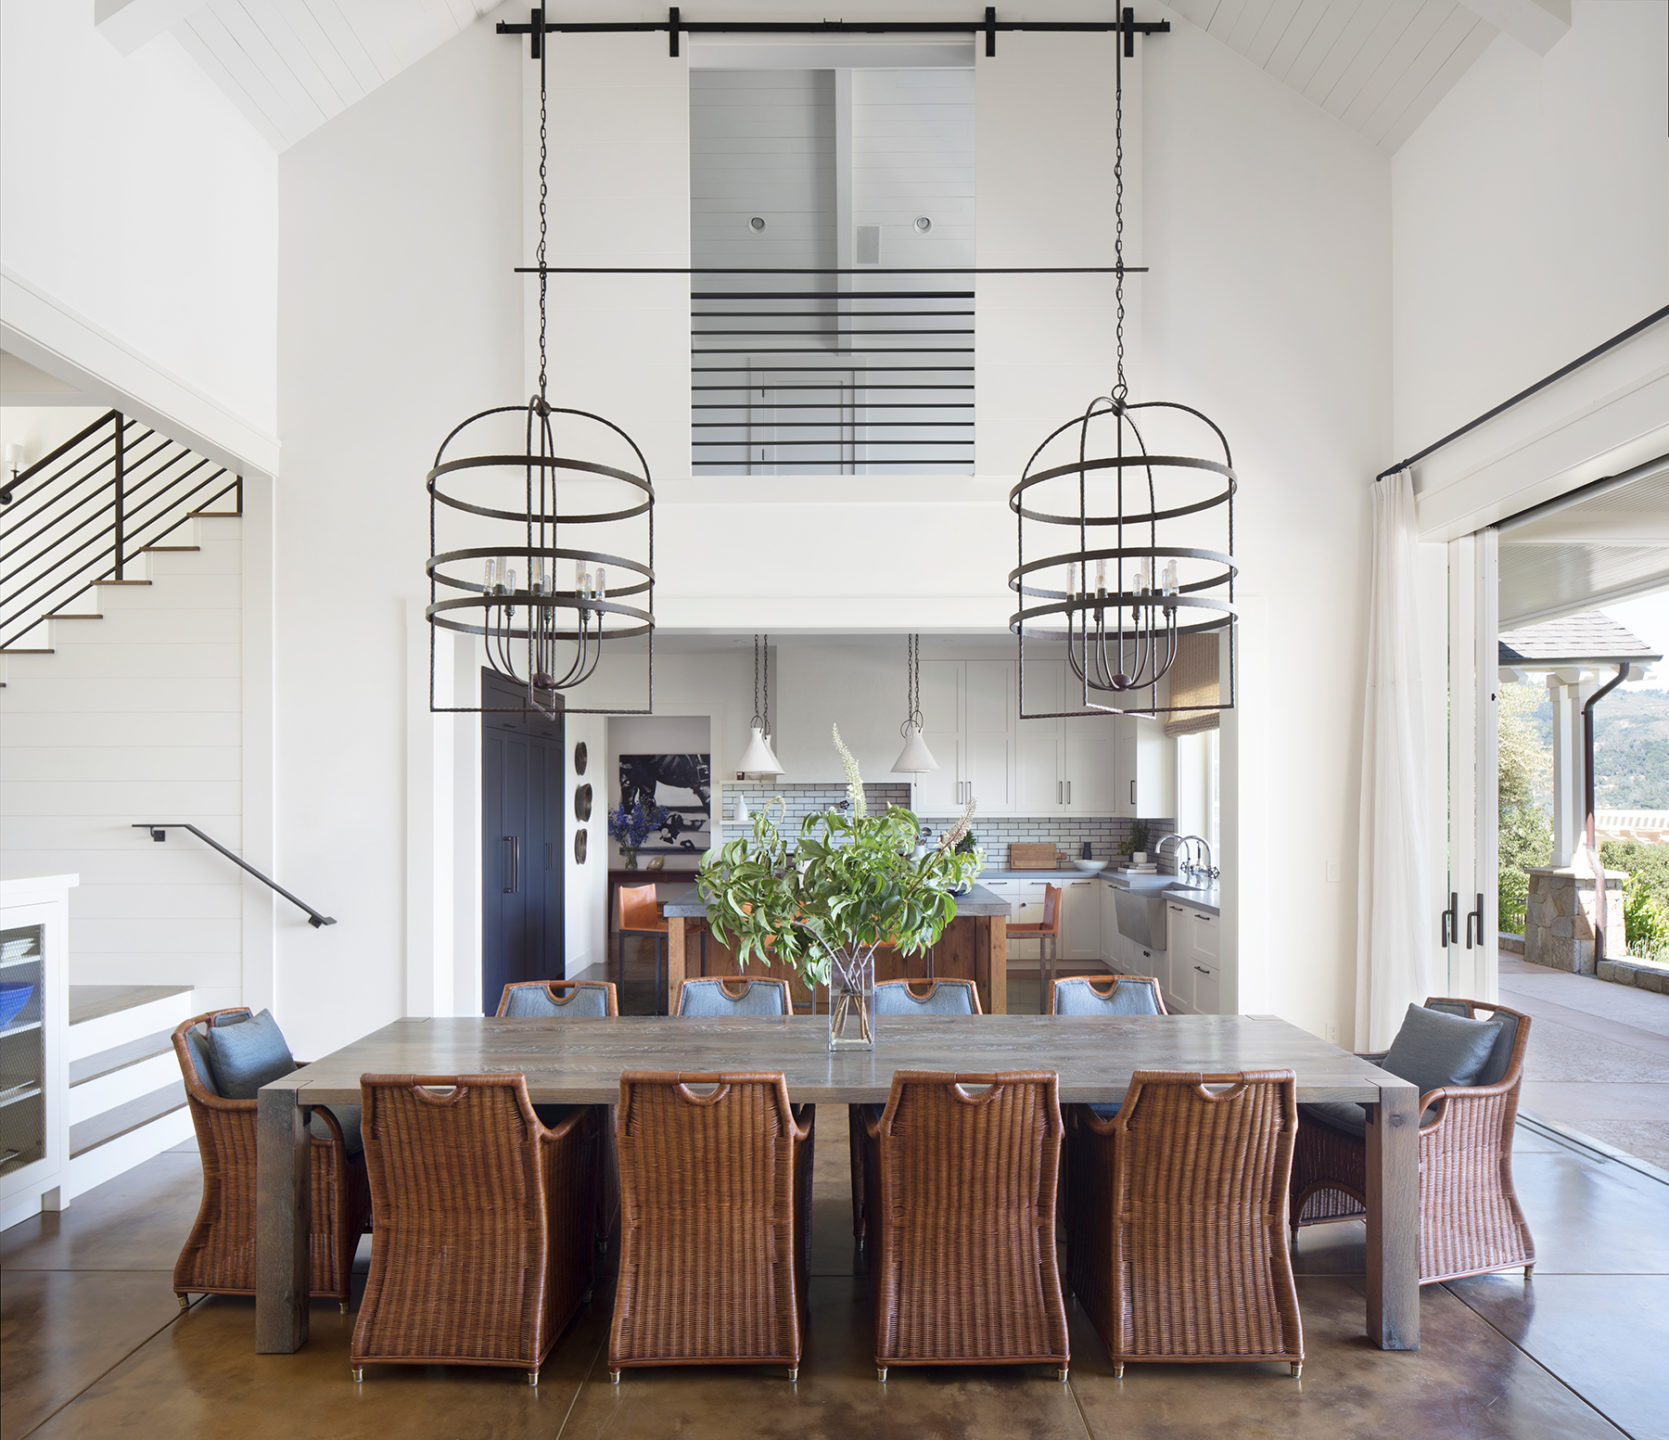 Jennifer_robins_interiors_projects_st_helena_III_4Fish_16_HR_dining_room_DR_kitchen